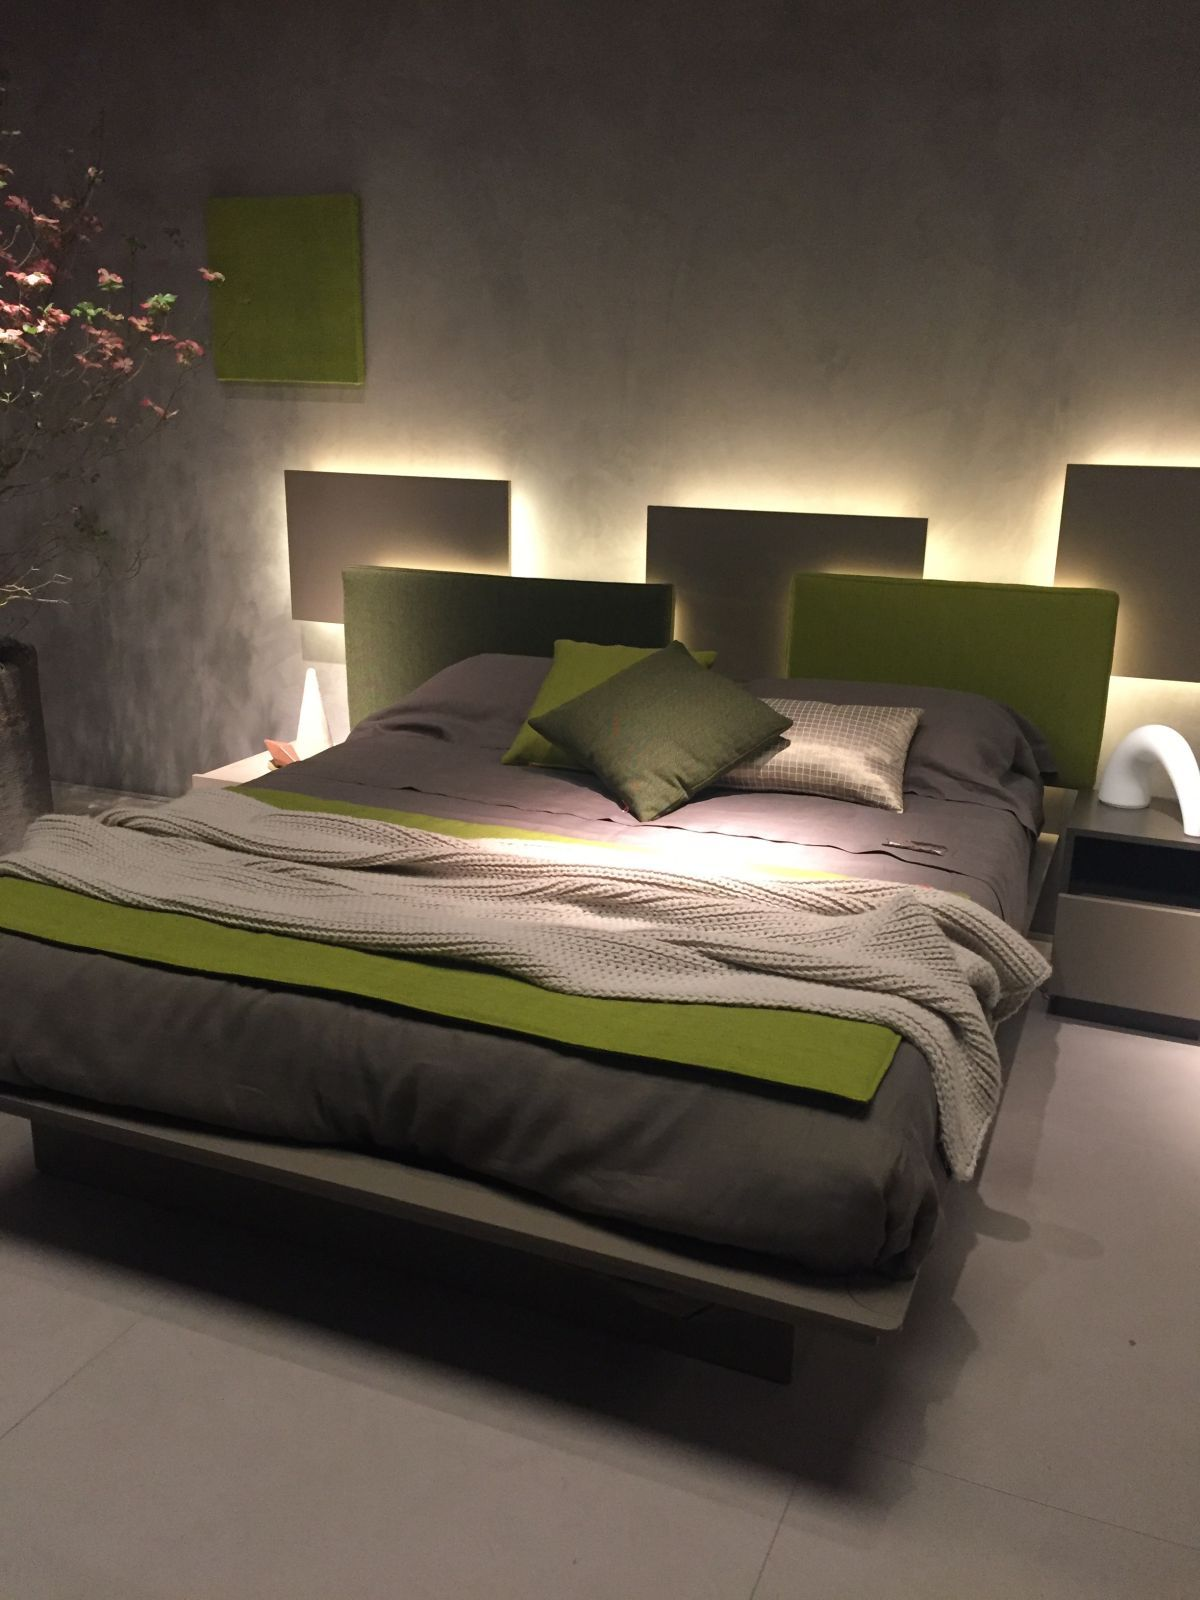 Image Associee Tete De Lit Lumineuse Chambre A Coucher Design Chambre Moderne